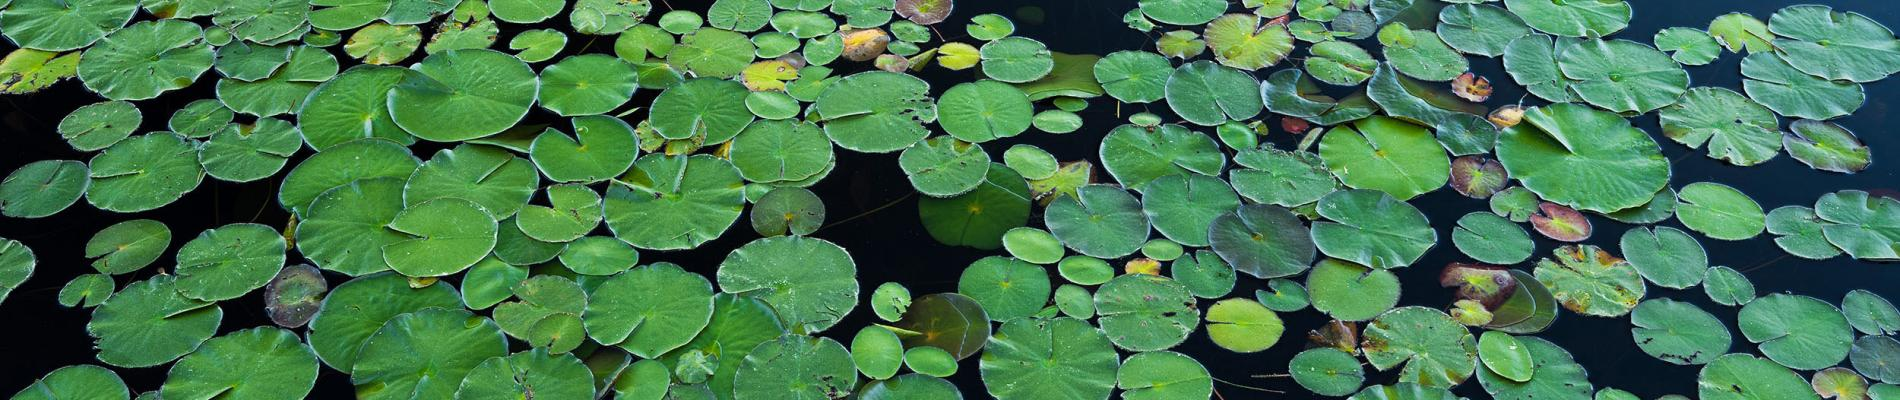 Pond Life: Bringing Nature to Life via Zoom